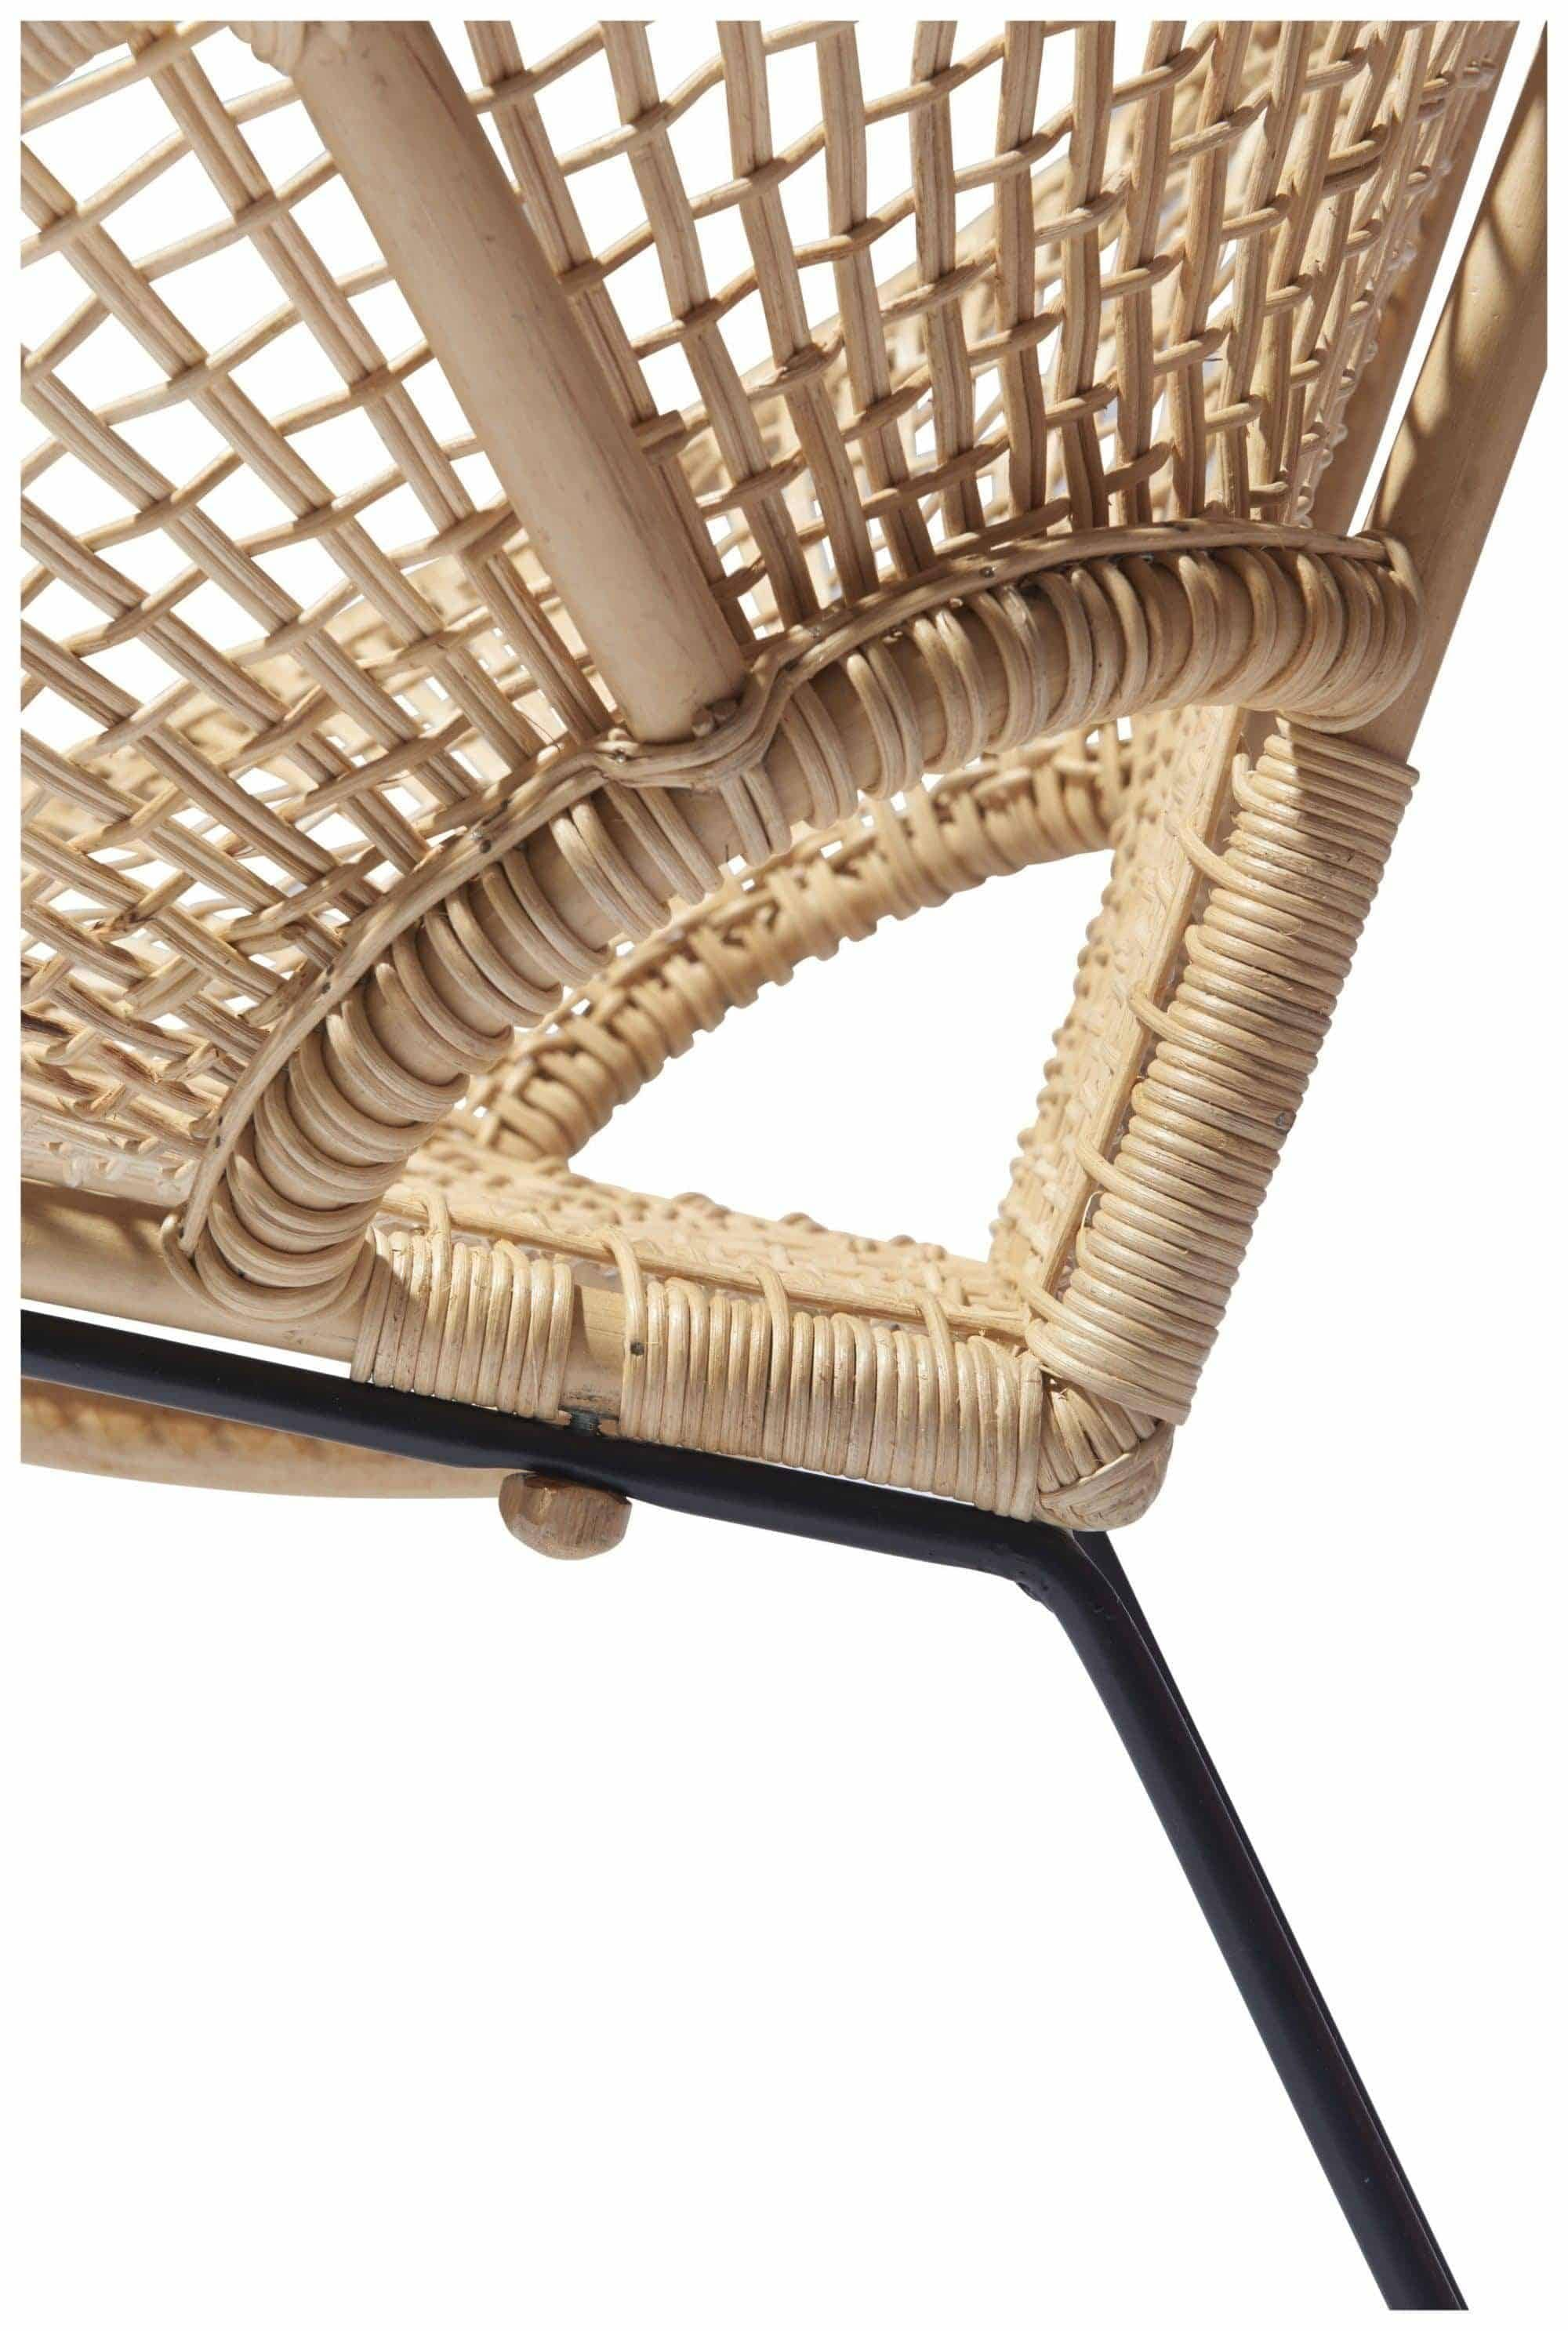 Silla Ubud fair furniture detalle ratán